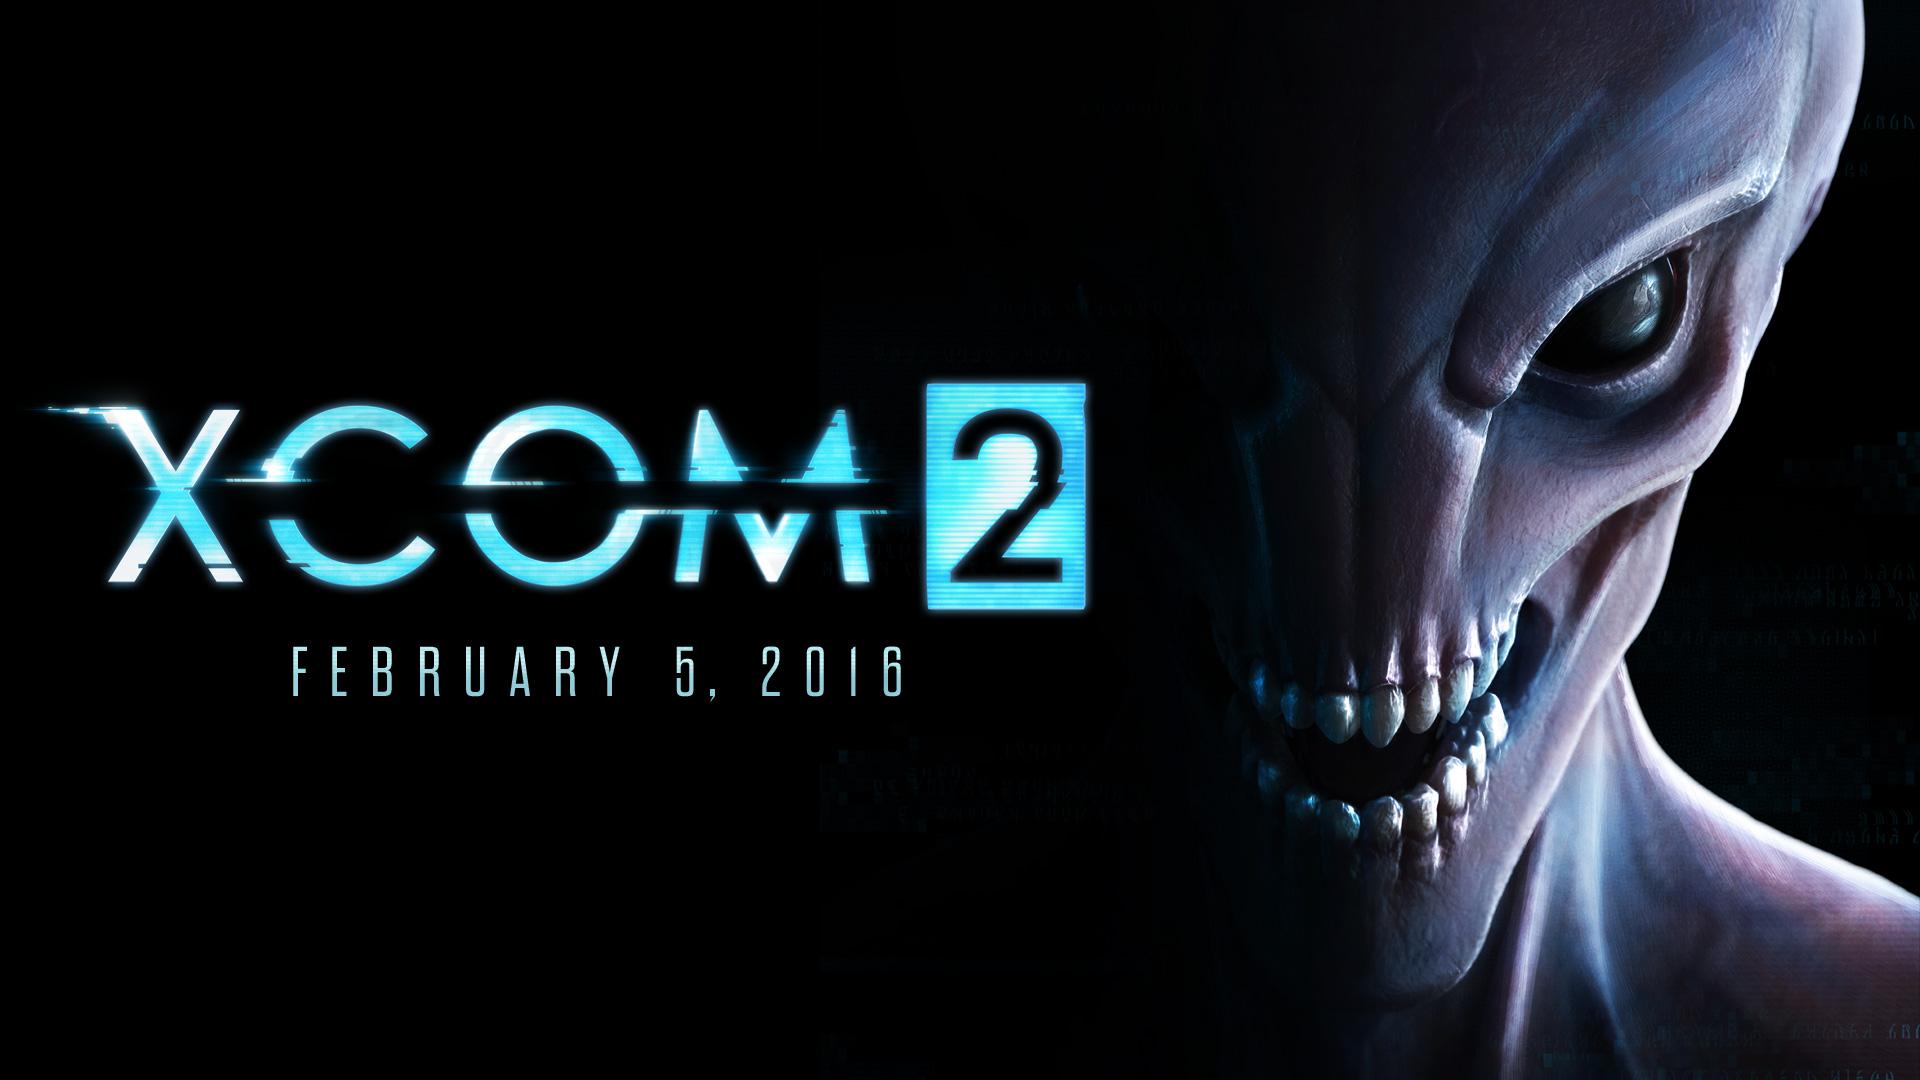 XCOM 2 odložen na únor 2016 113420